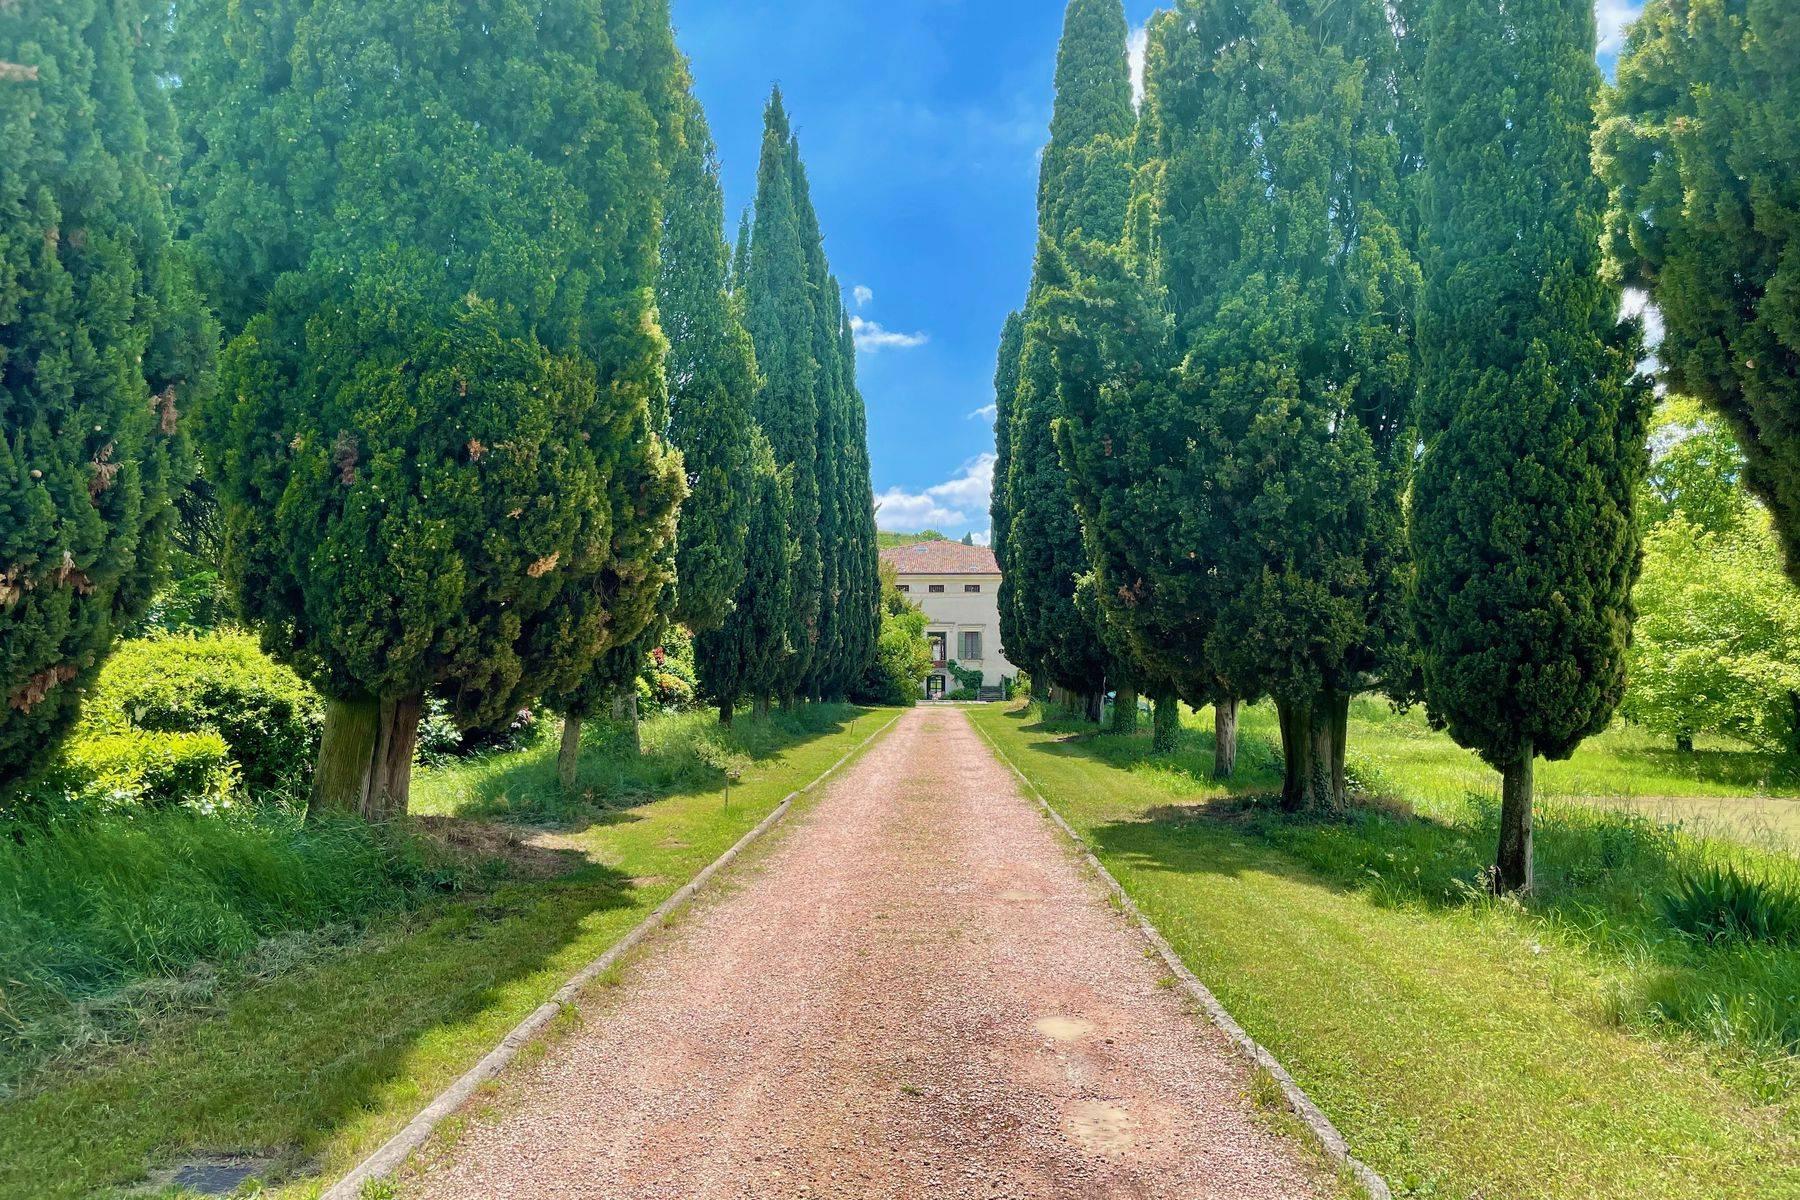 Affascinante villa Veneta a pochi minuti da Verona - 34